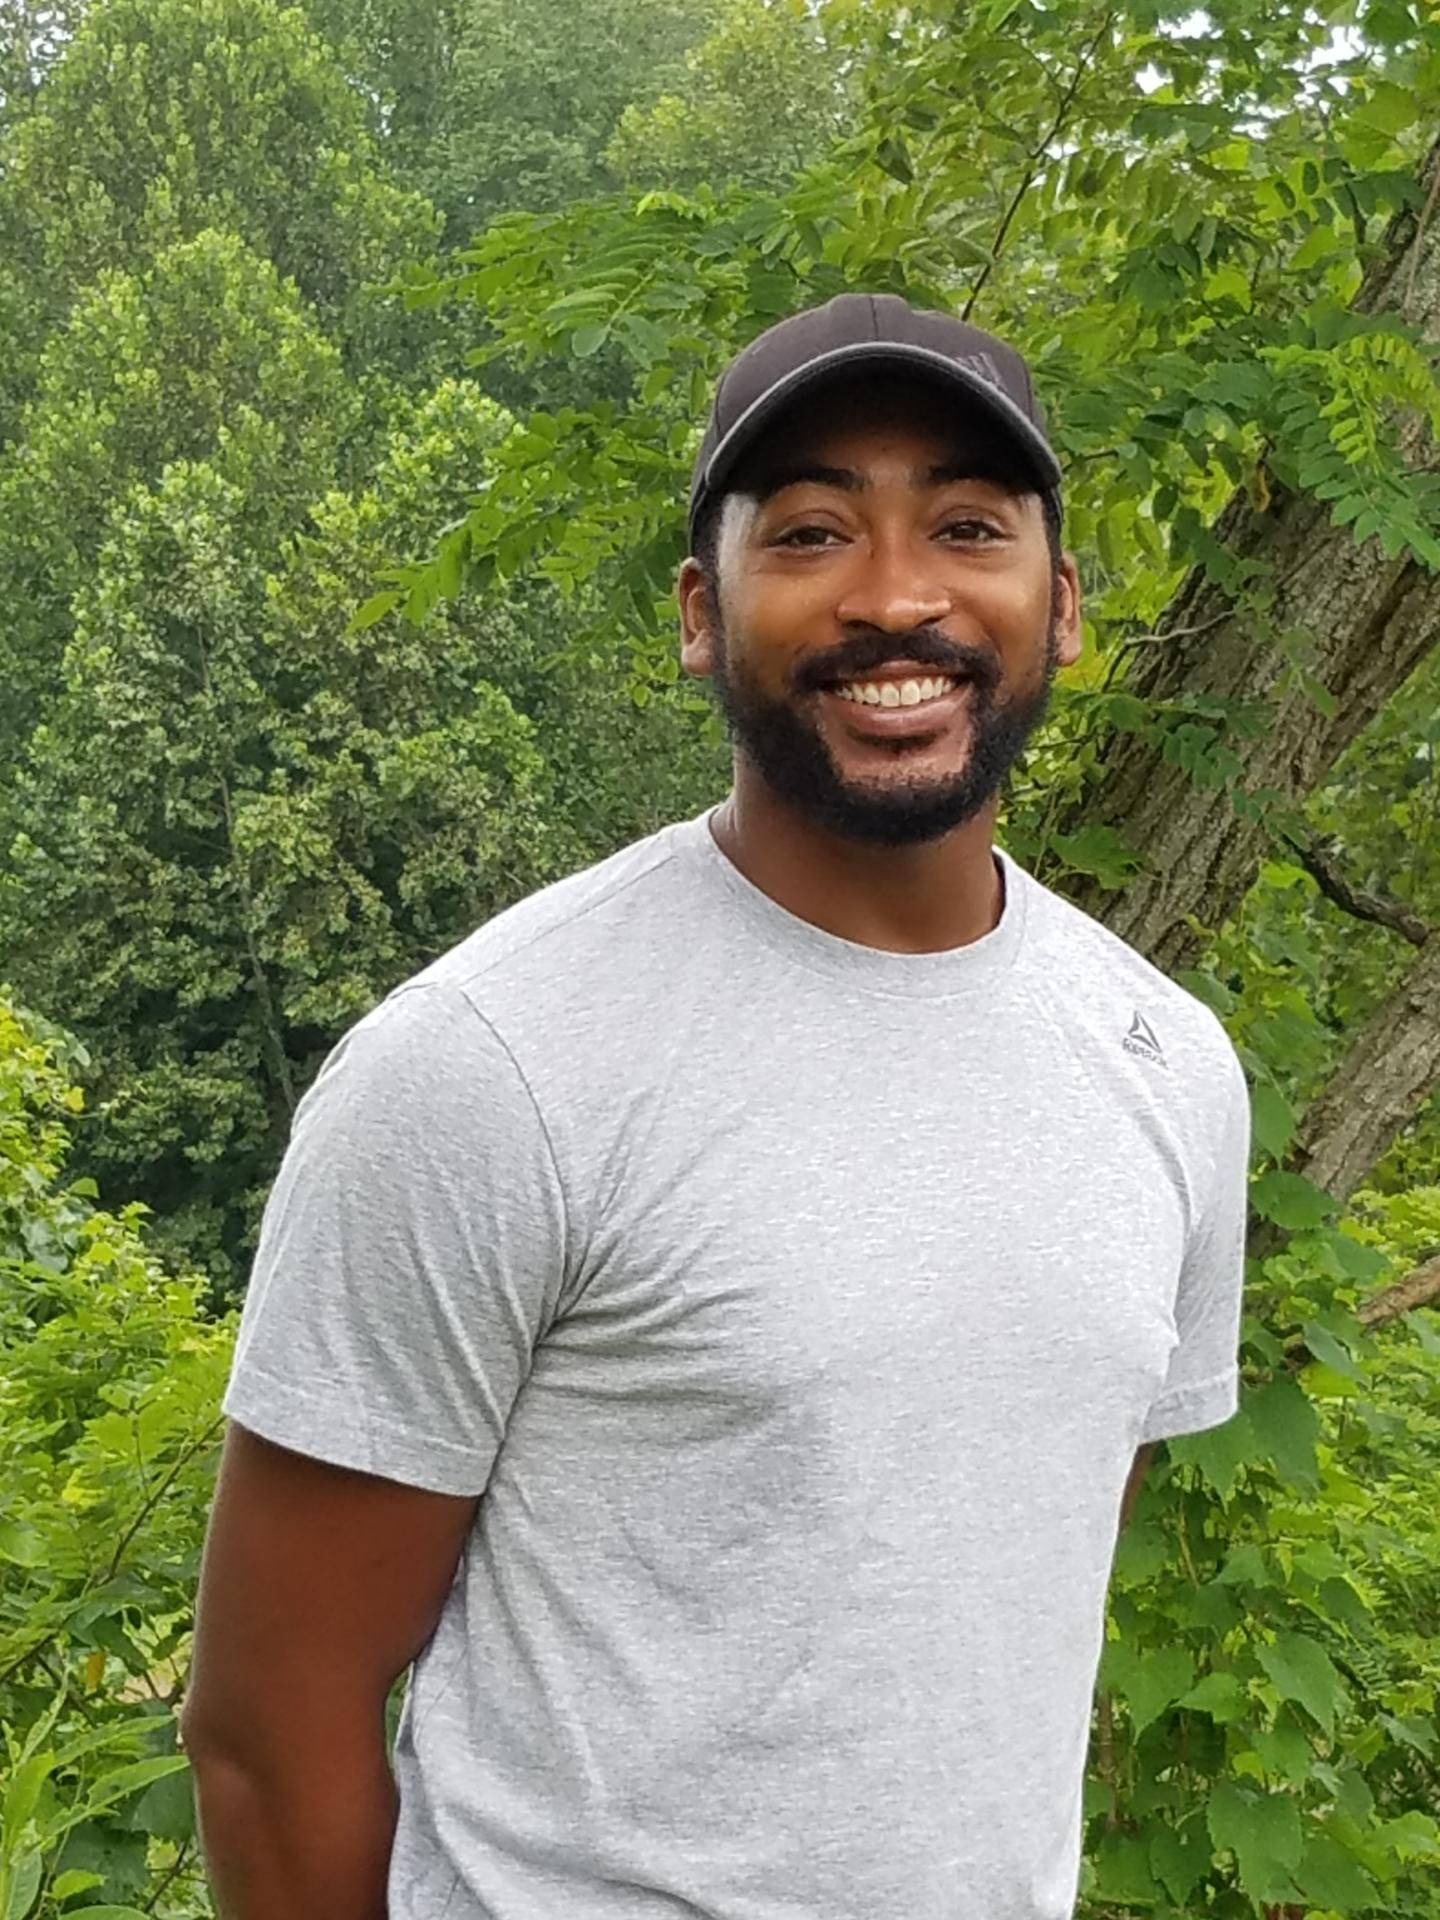 Reggie Morrow, Donation Station Coordinator